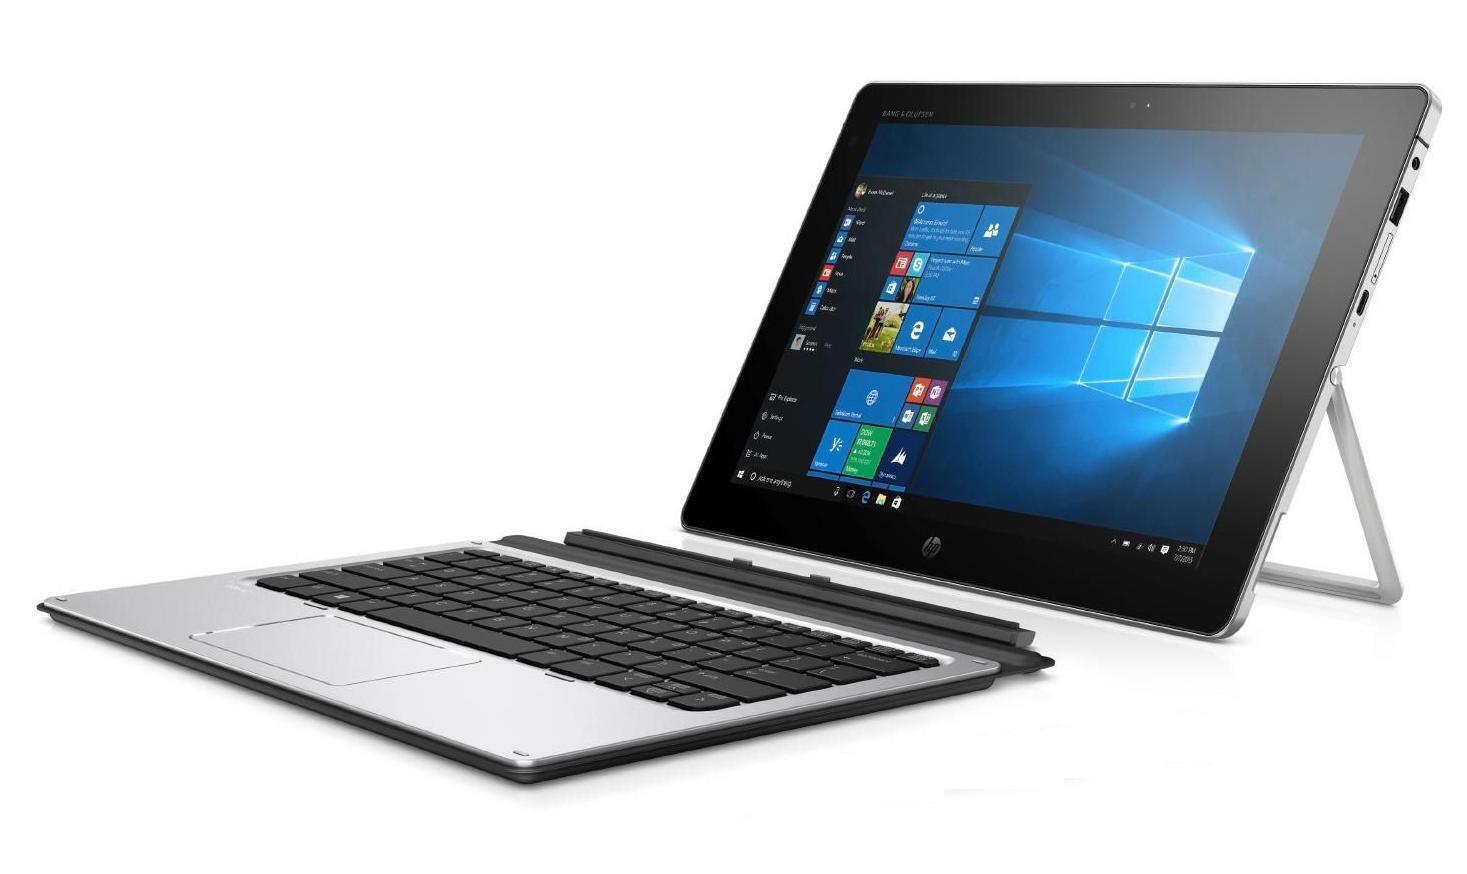 HP Elite x2 1012 G1 Tablet 2in1 m5-6Y57 8GB 256GB SSD Win10 Convertible